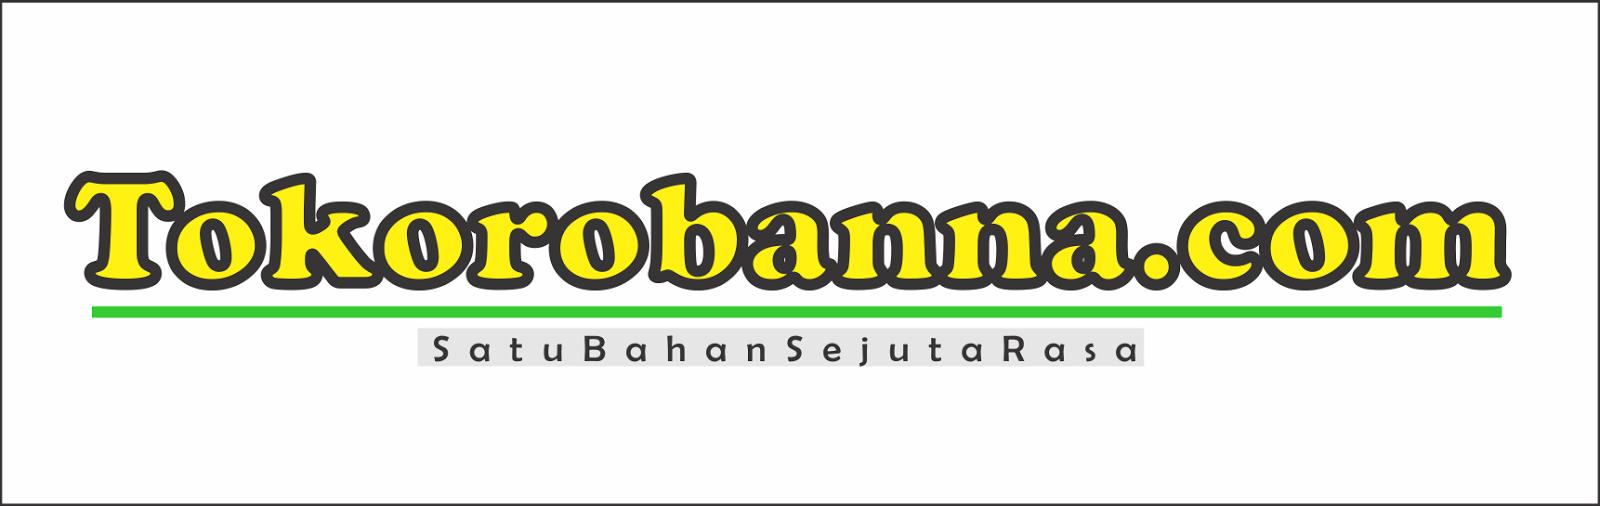 Toko Robanna